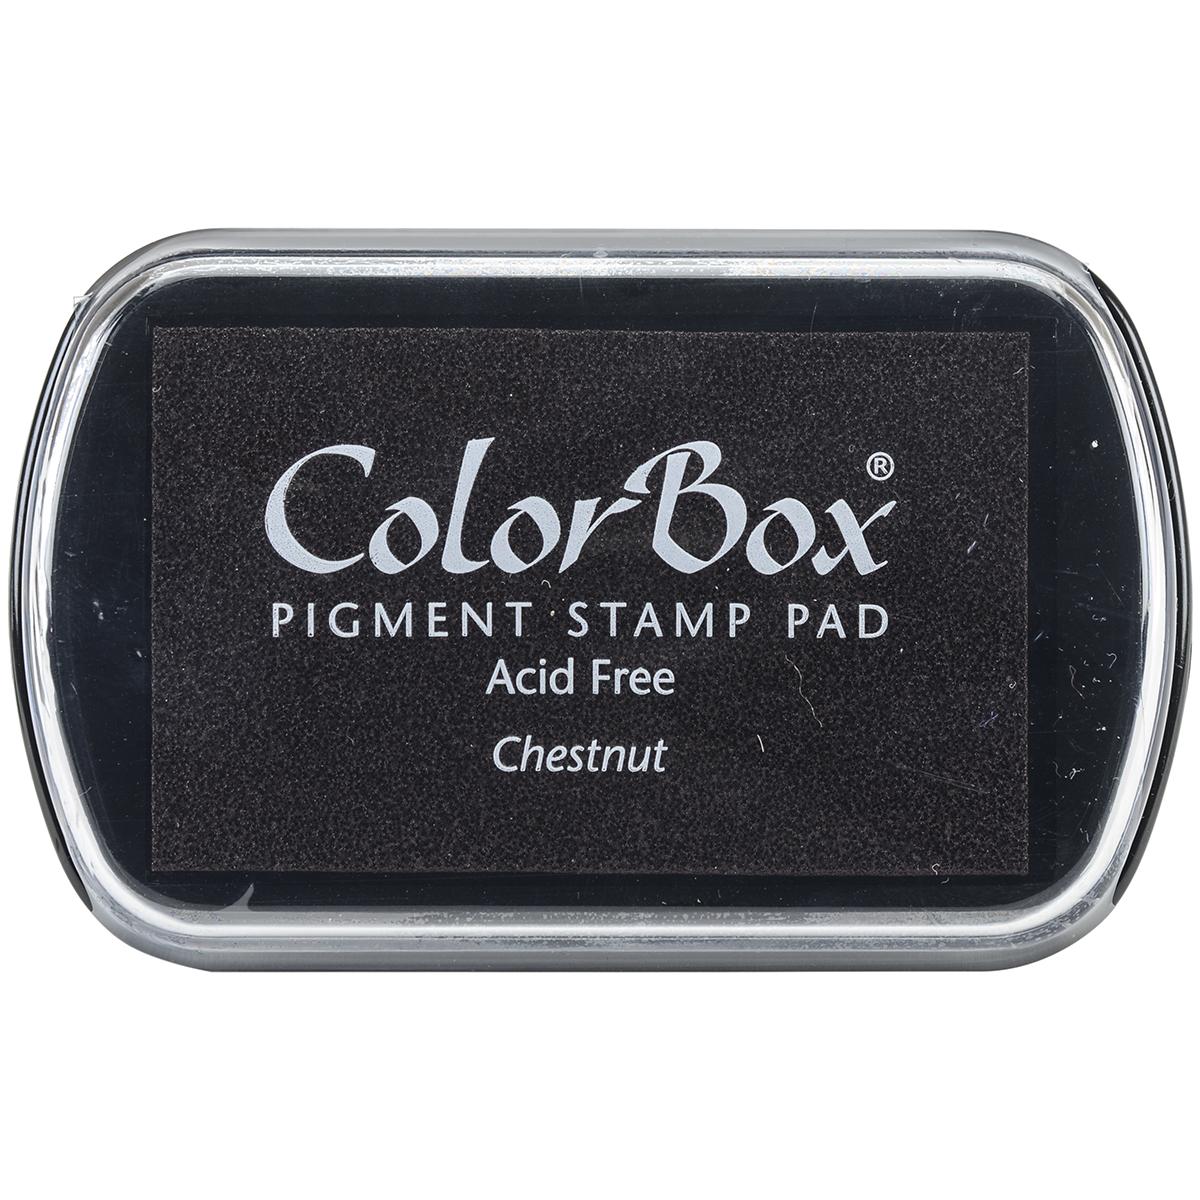 Pigment Stamp Pad